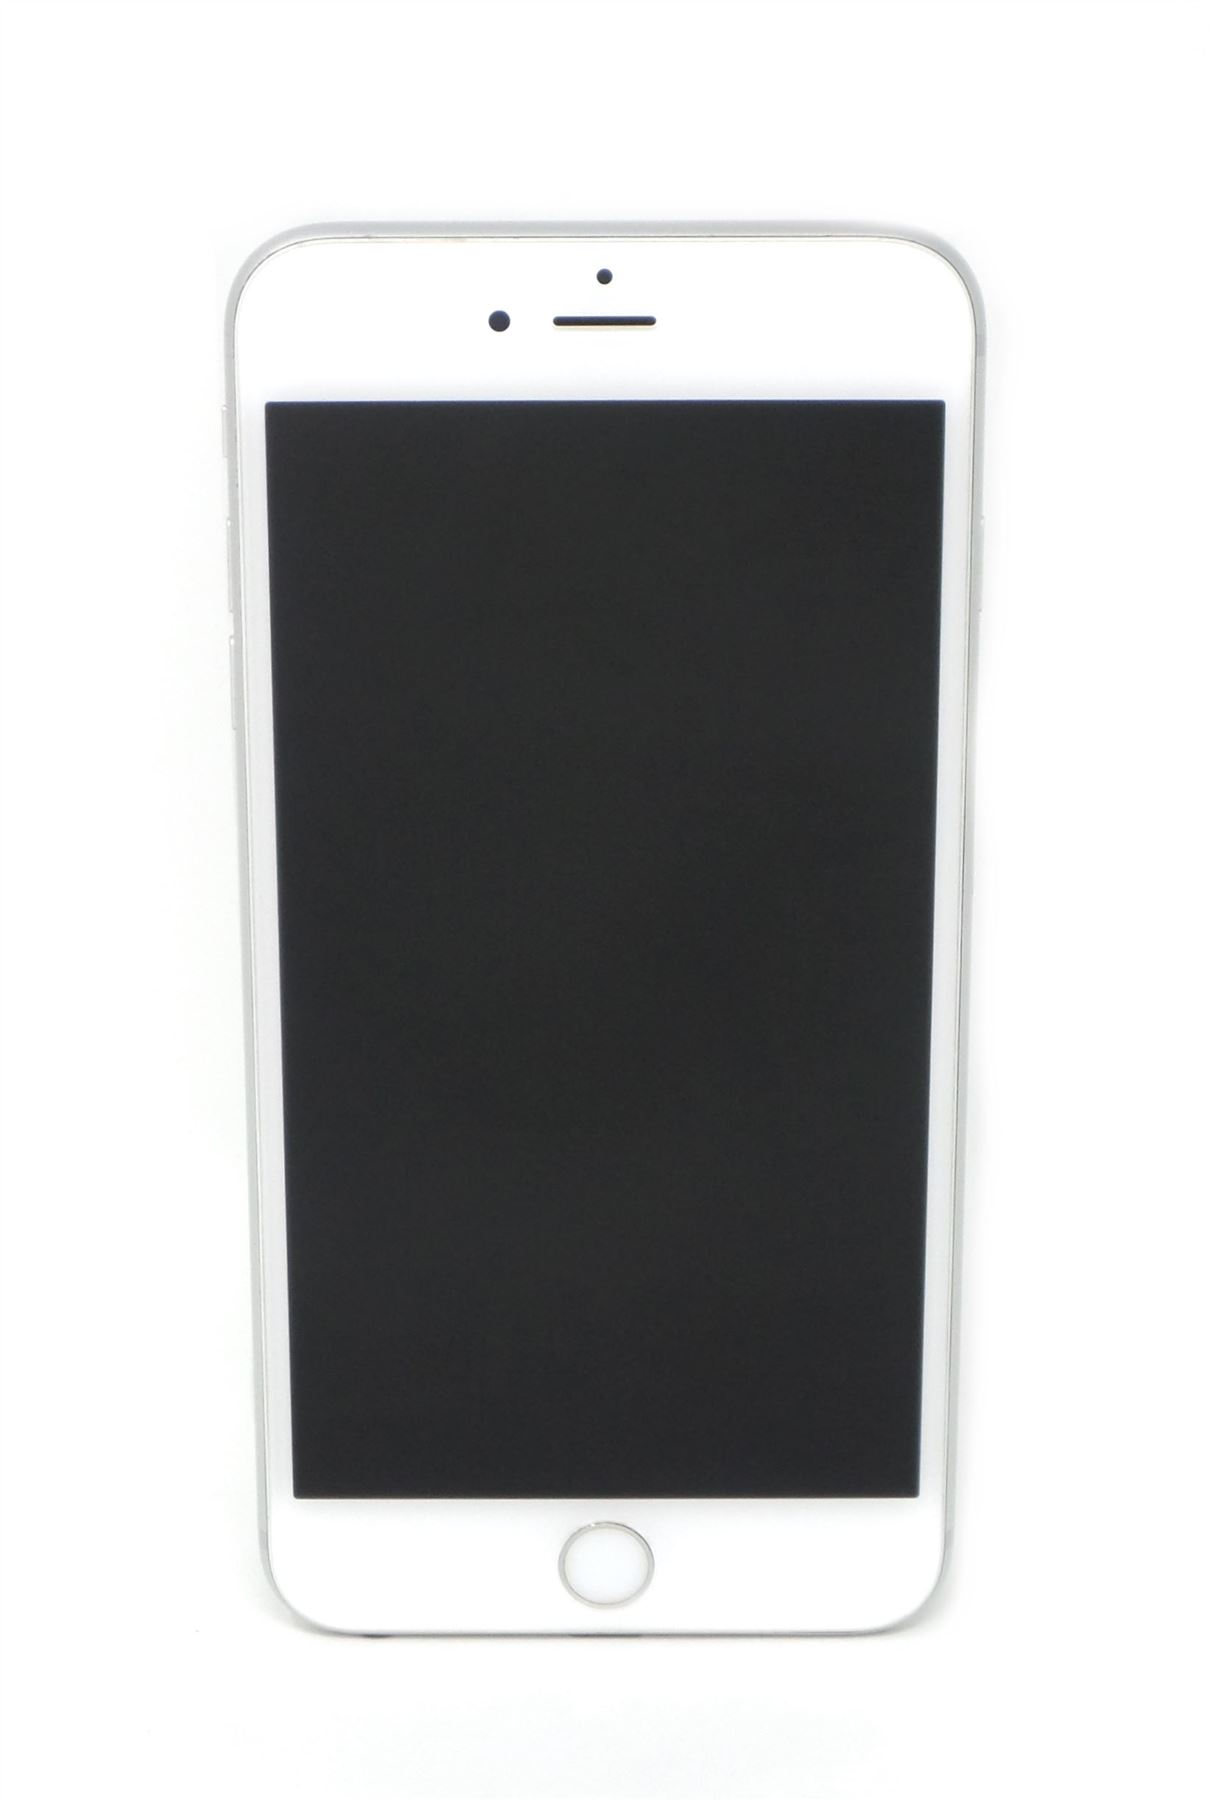 Apple-iPhone-6S-Plus-Carrier-Options-AT-amp-T-T-Mobile-Verizon-Unlocked-16-64-128GB thumbnail 20